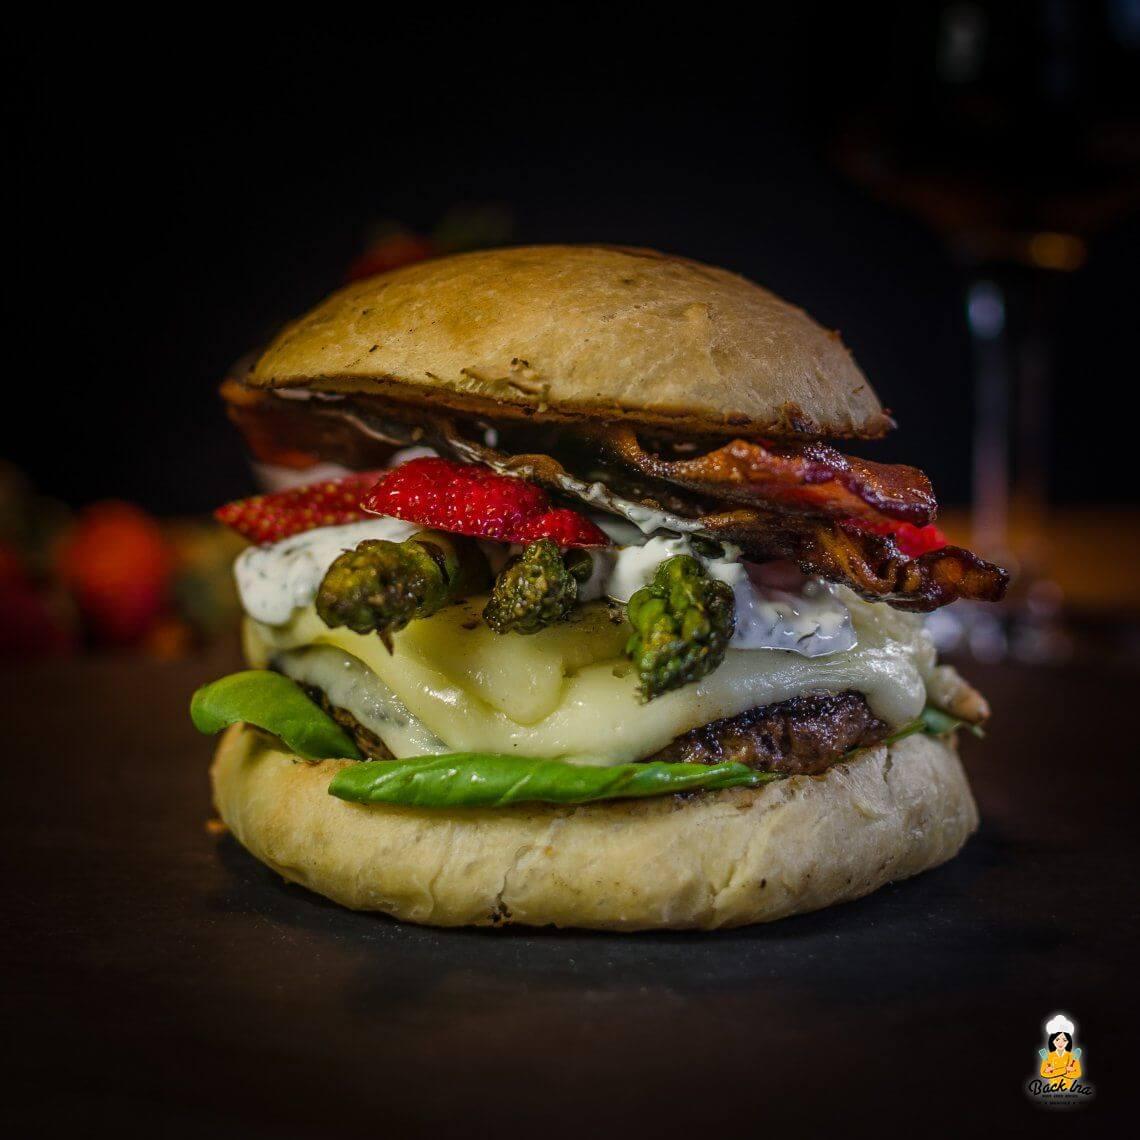 Tag des Burgers (Spargel-Burger mit Erdbeeren)